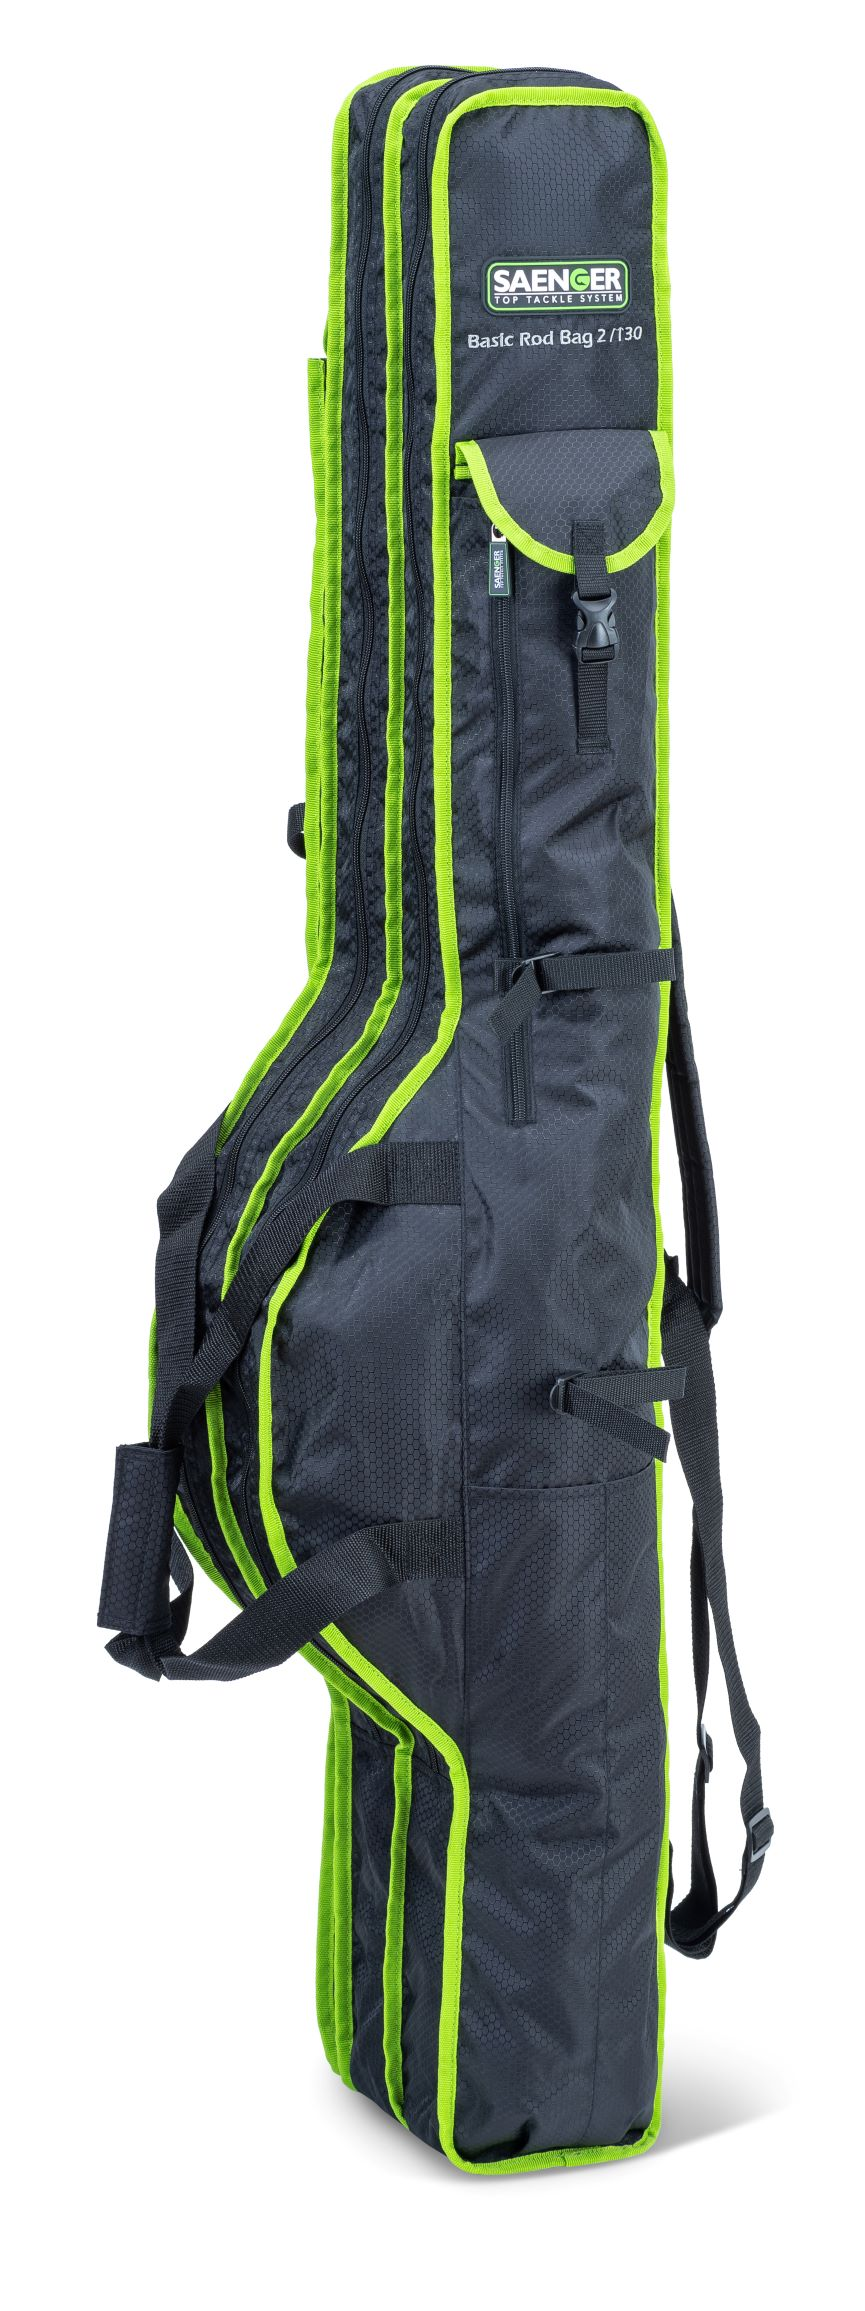 Saenger pouzdro na pruty Basic 2 Rod Bag 130